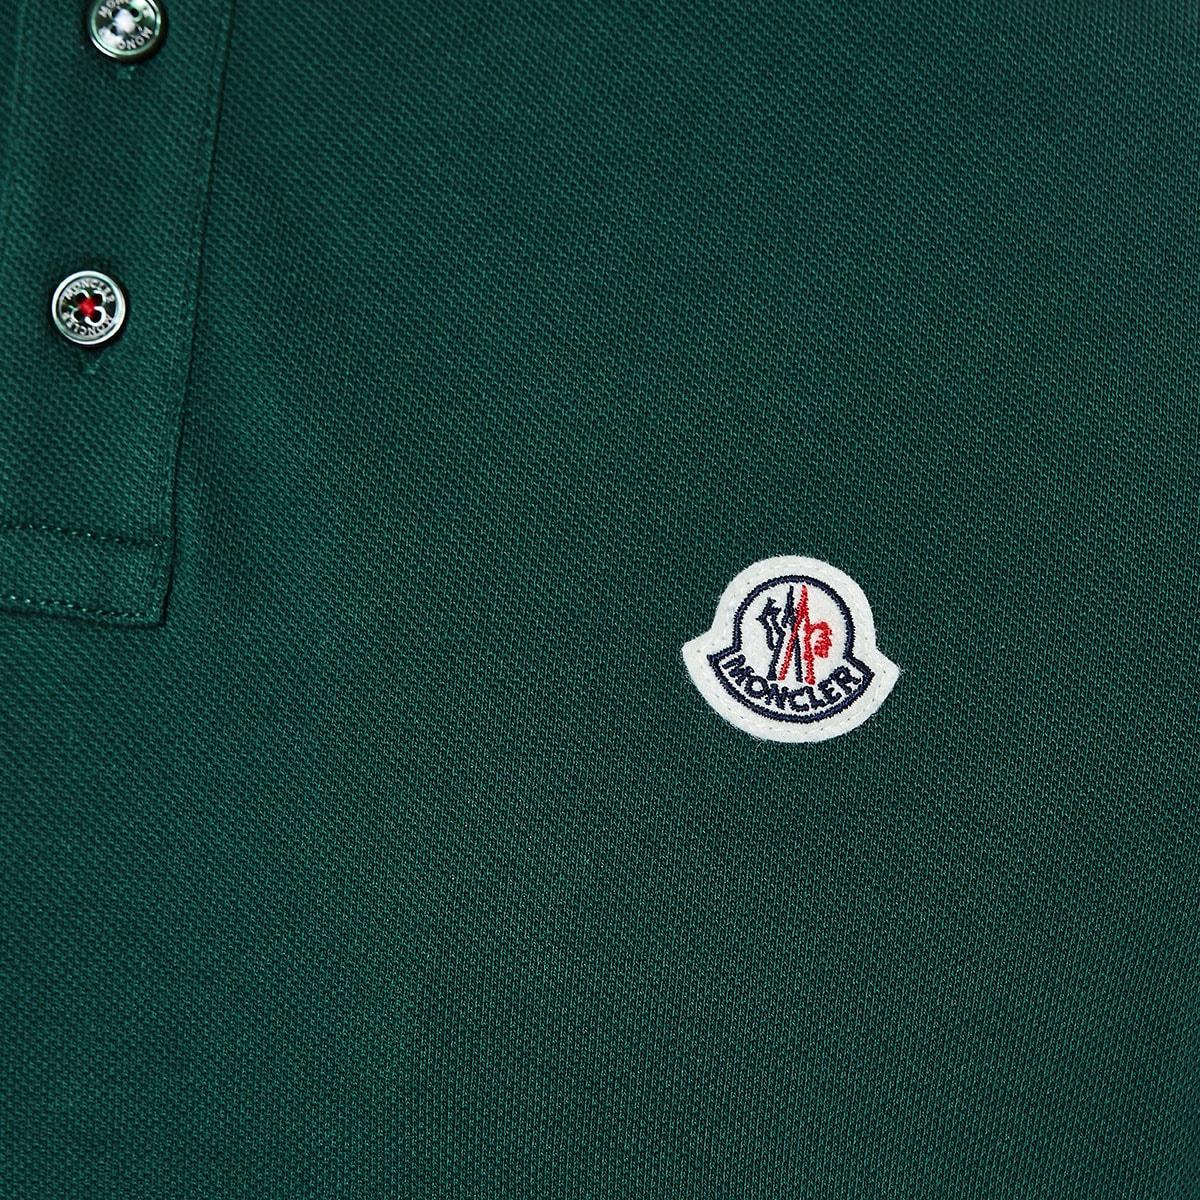 Stripe-trimmed logo polo shirt